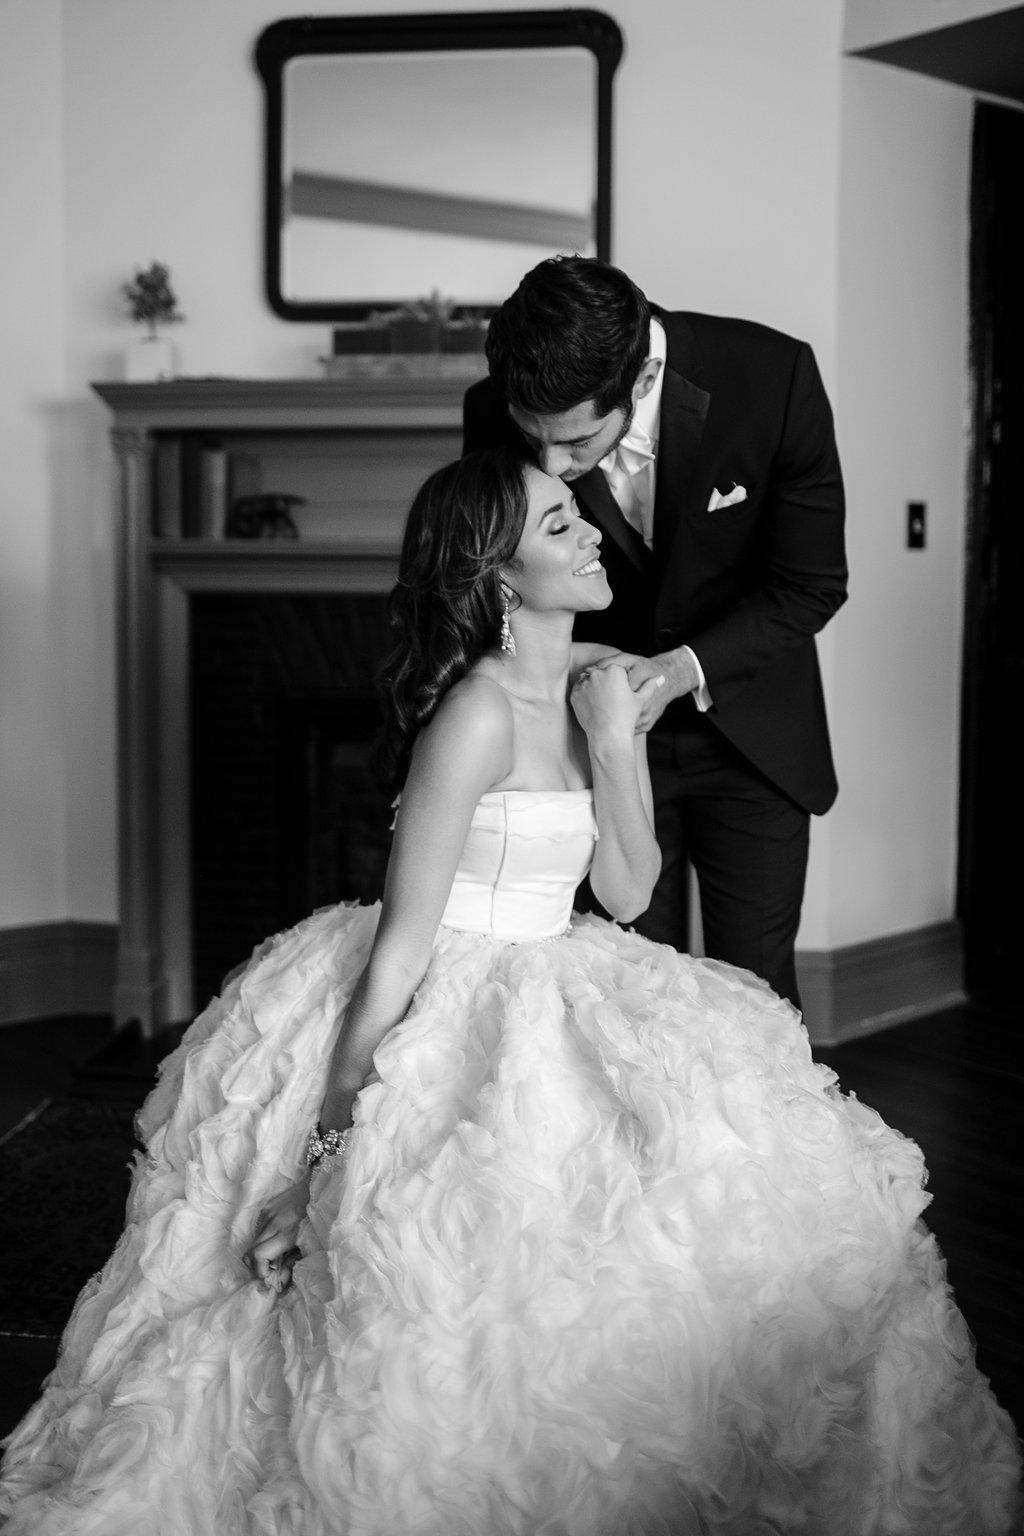 NYC_Highline_Hotel_Bridal_Shoot_PetronellaPhotography-45.jpg